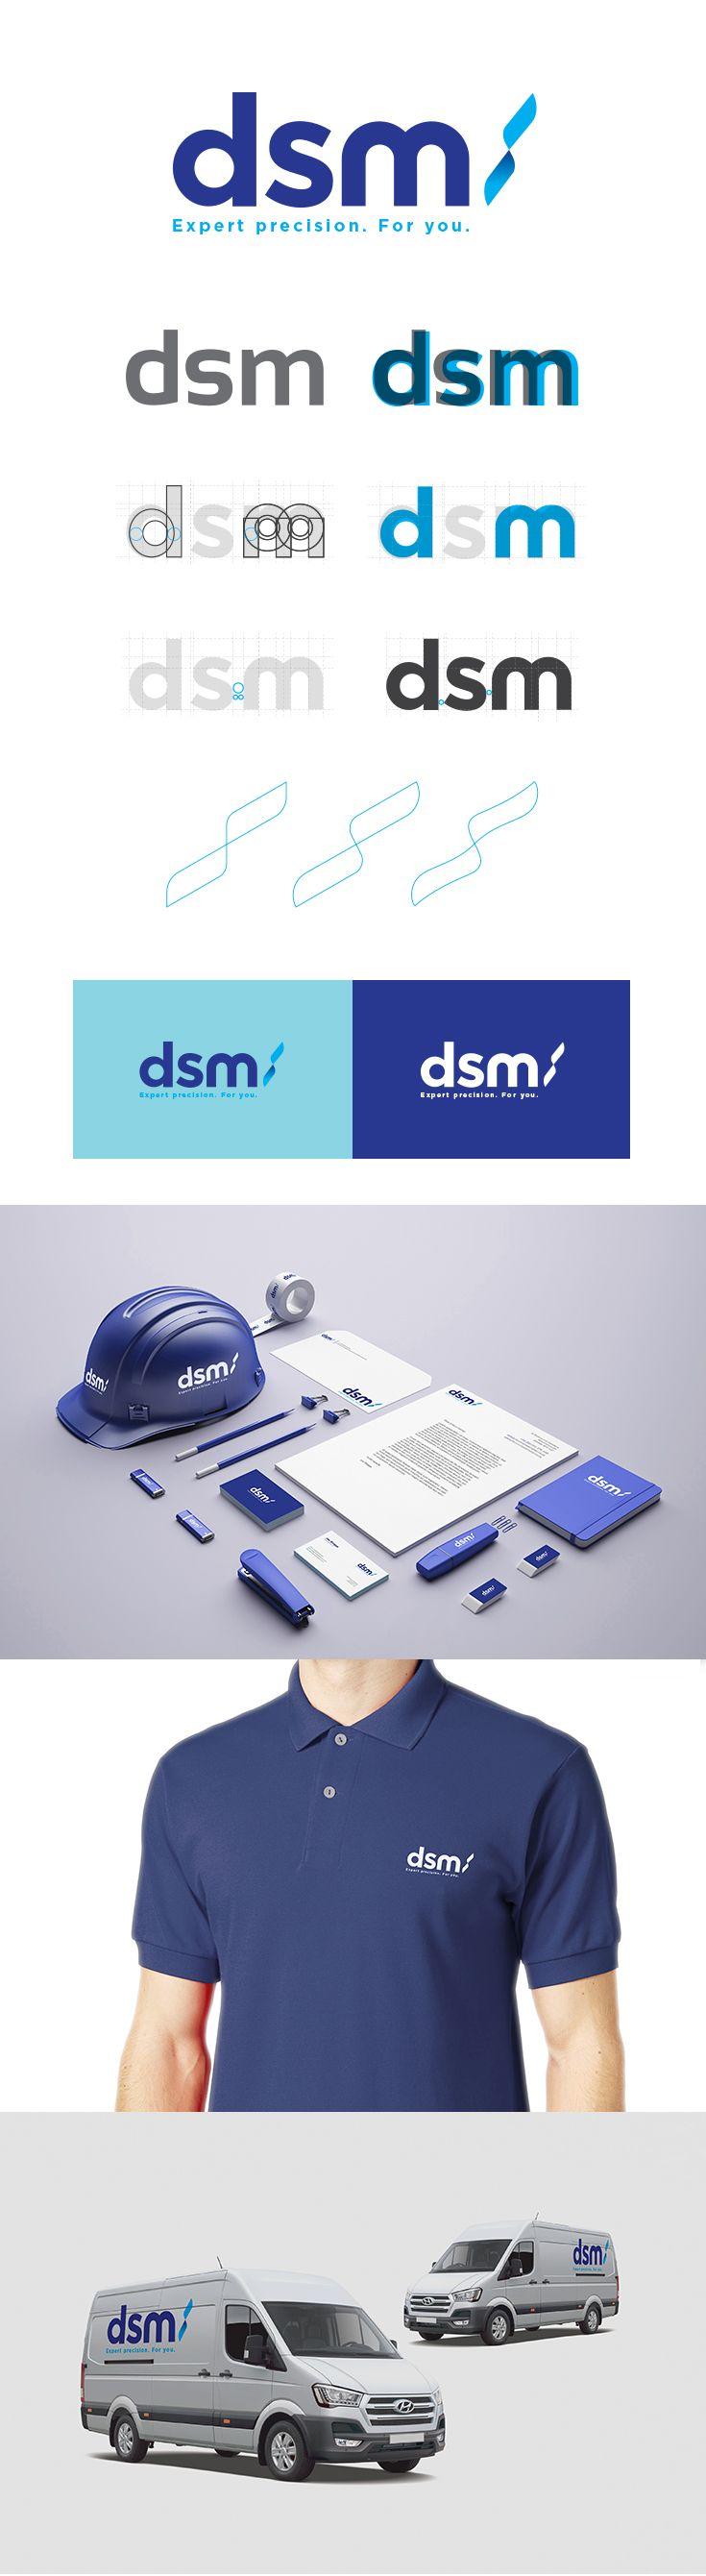 A new clean & modern identity for forward thinking metal company DSM. #branding #logo #design